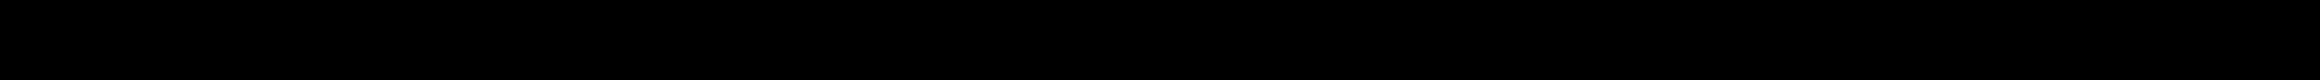 JURID 1K0 698 151, 1K0698151C, 1K0 698 151 E, 3C0698151A, 3C0698151C Juego de pastillas de freno